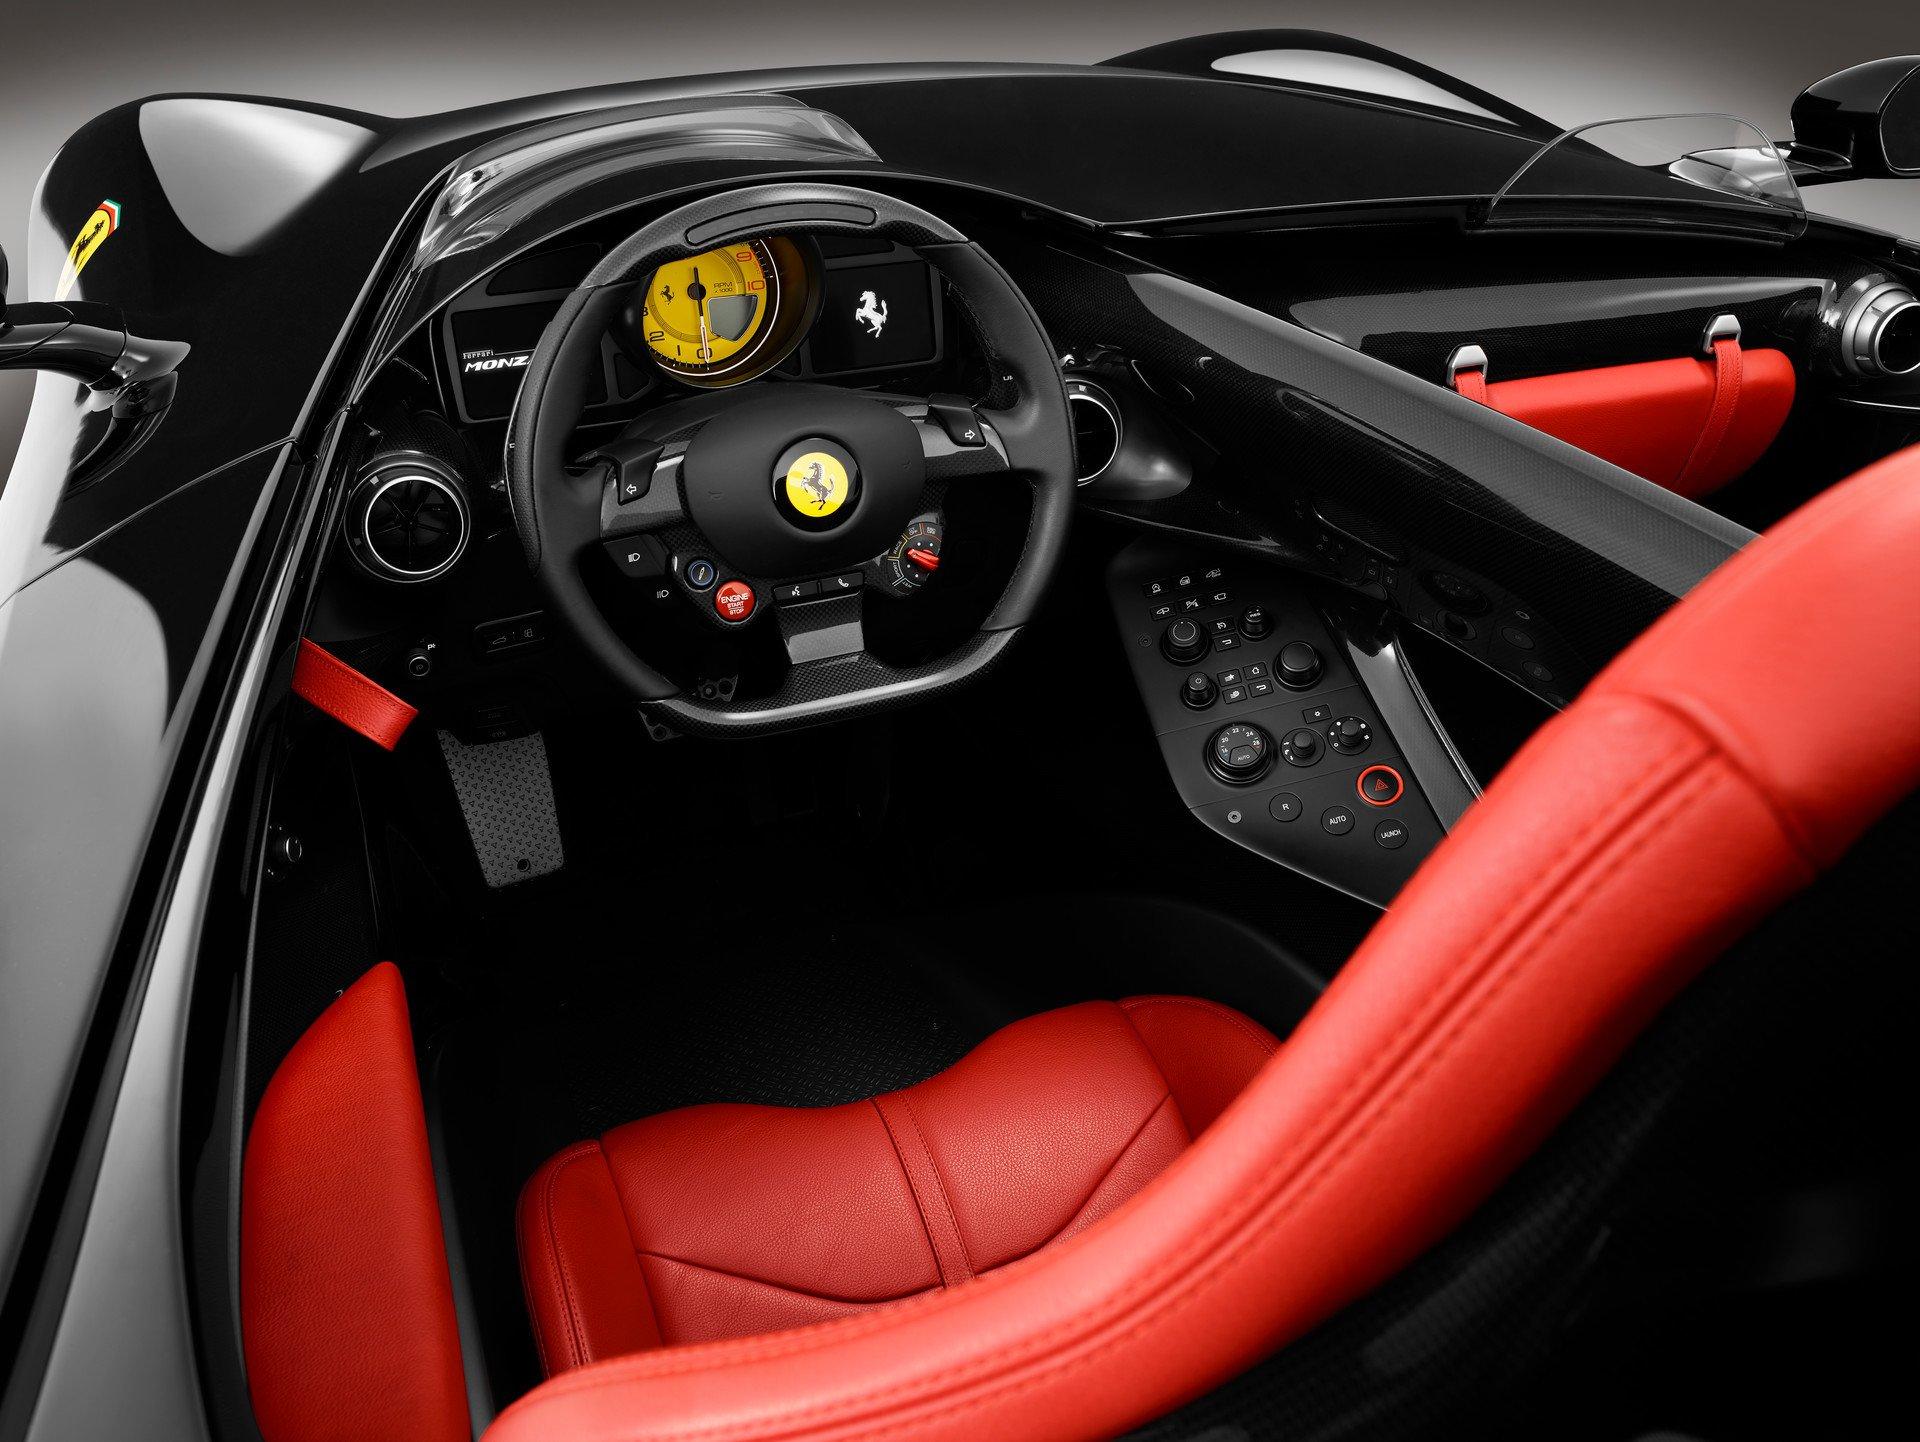 2020 Ferrari Monza Sp2 In Barcelona Catalonia Spain For Sale 10803892